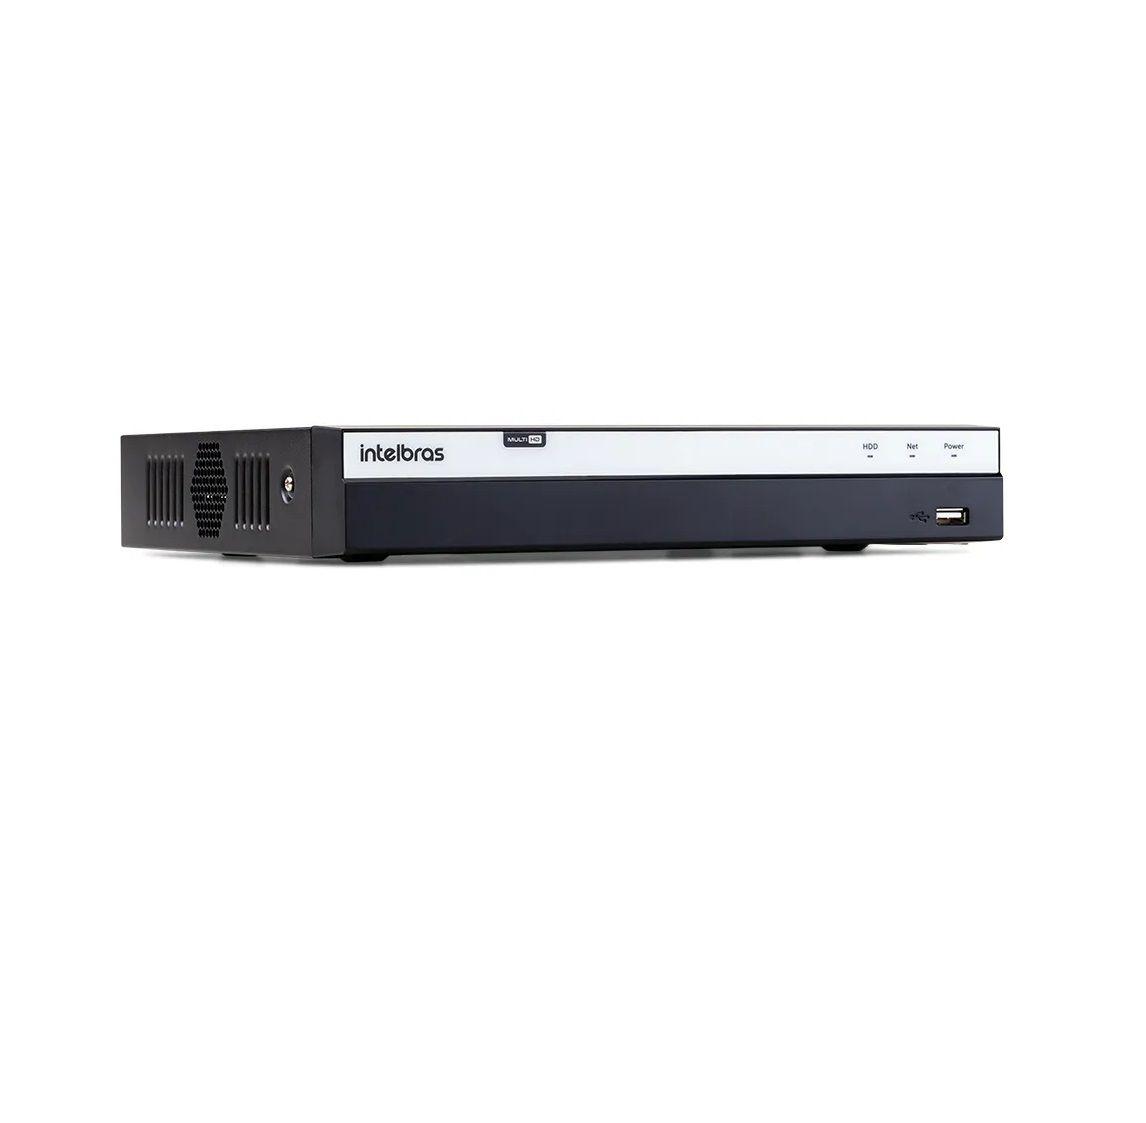 DVR Stand Alone Intelbras MHDX 3108 08 Canais Full HD 1080p Multi HD + 04 Canais IP 5 Mp + HD WD Purple 1TB